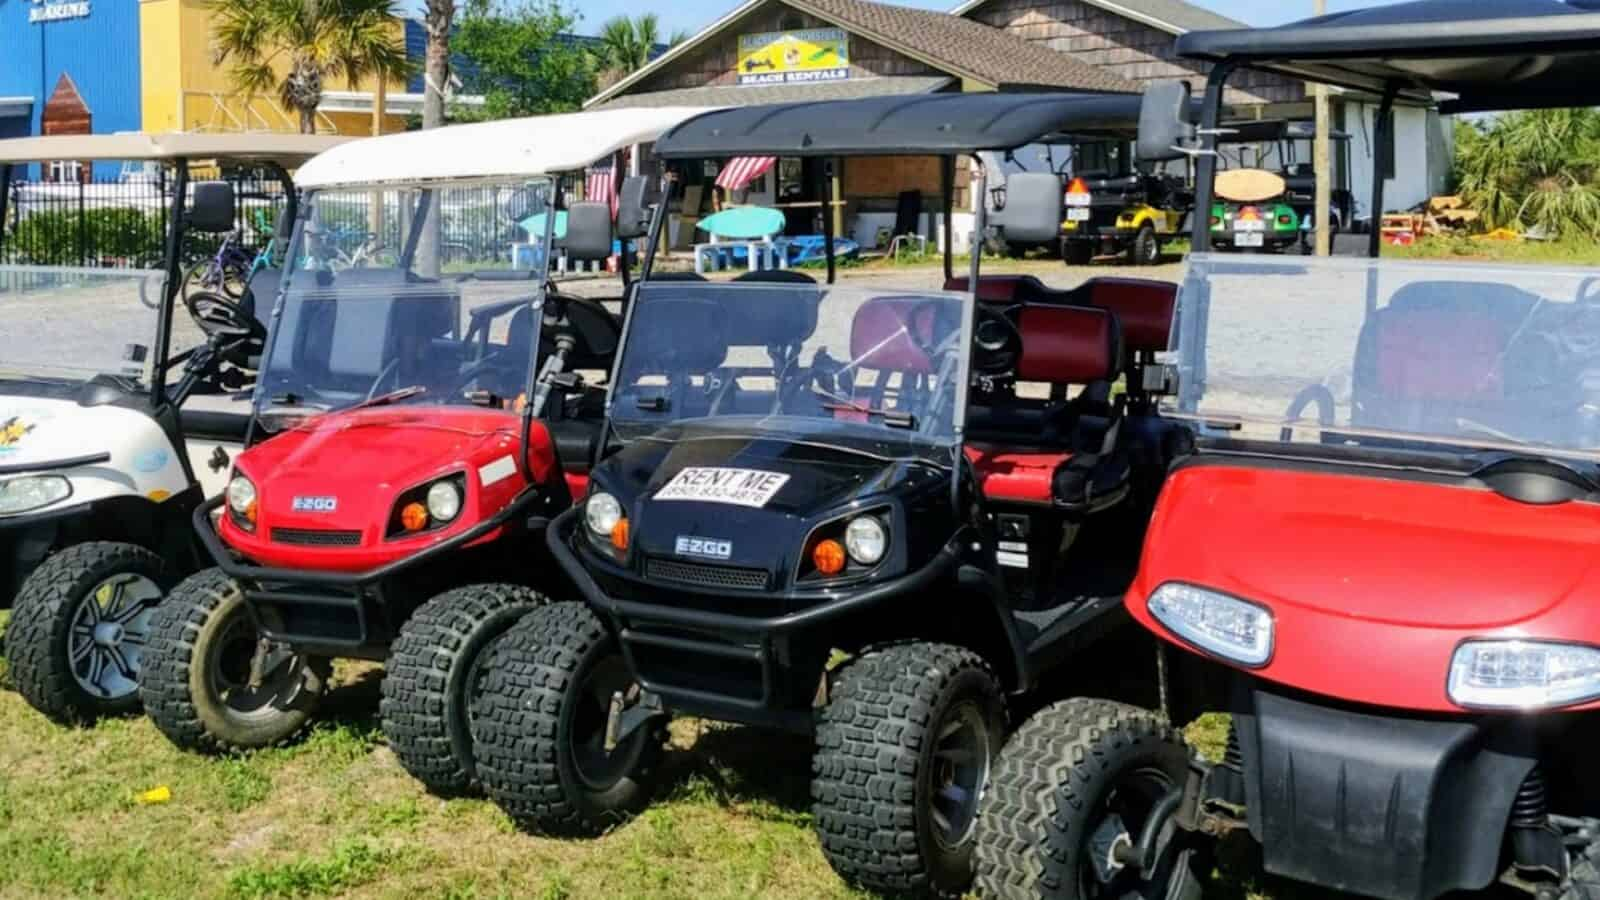 Beachside Motorsports - Panama City Beach Golf Cart Rentals